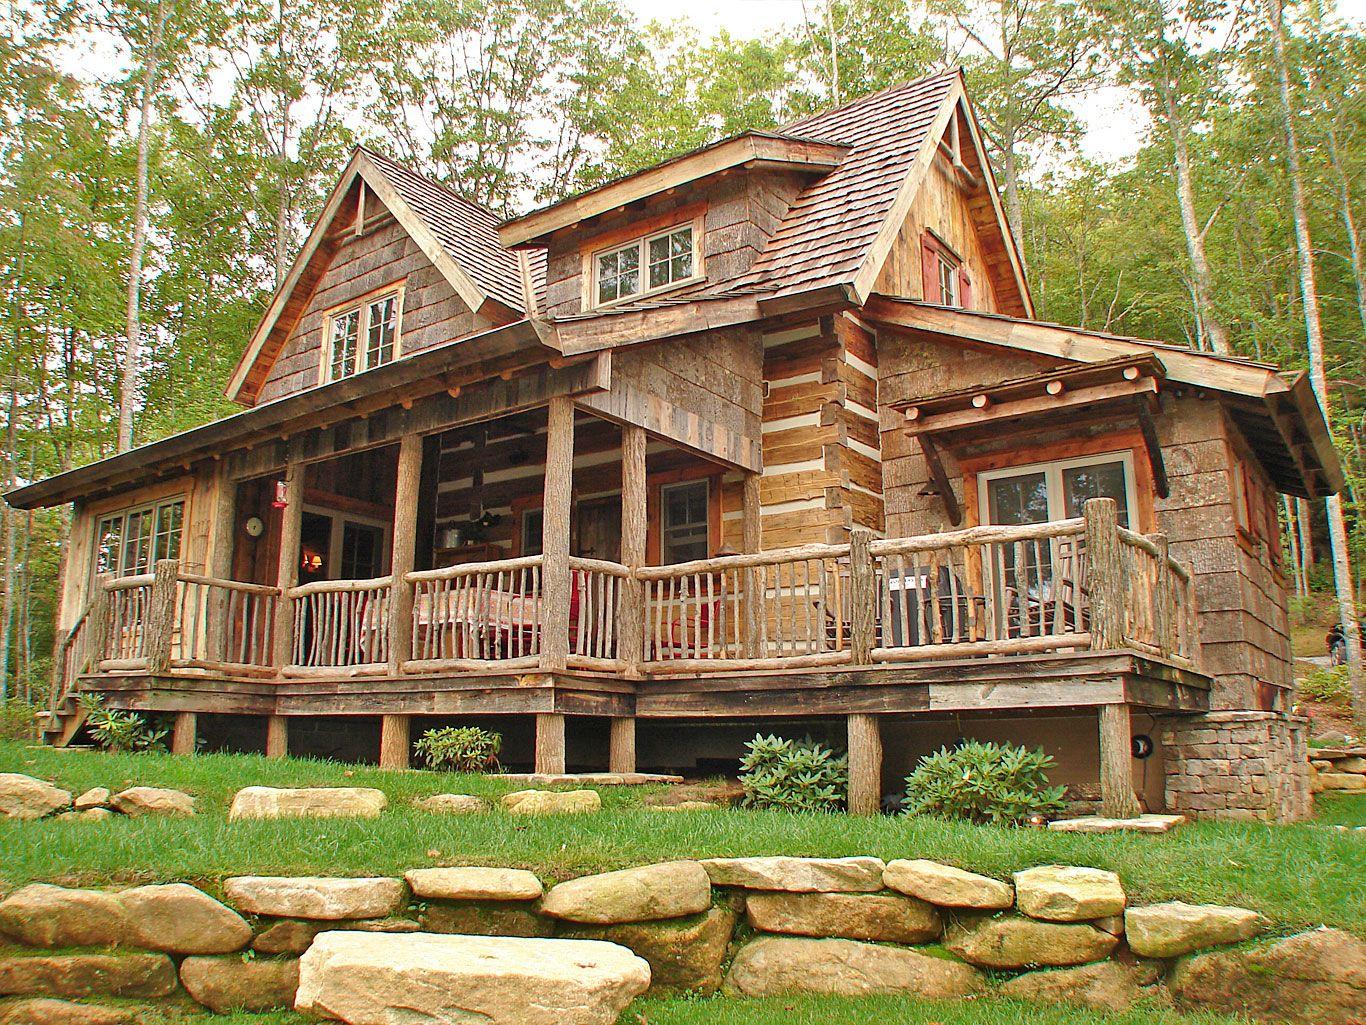 Redthorn Cabin Mountainworks . Rustic Living Log